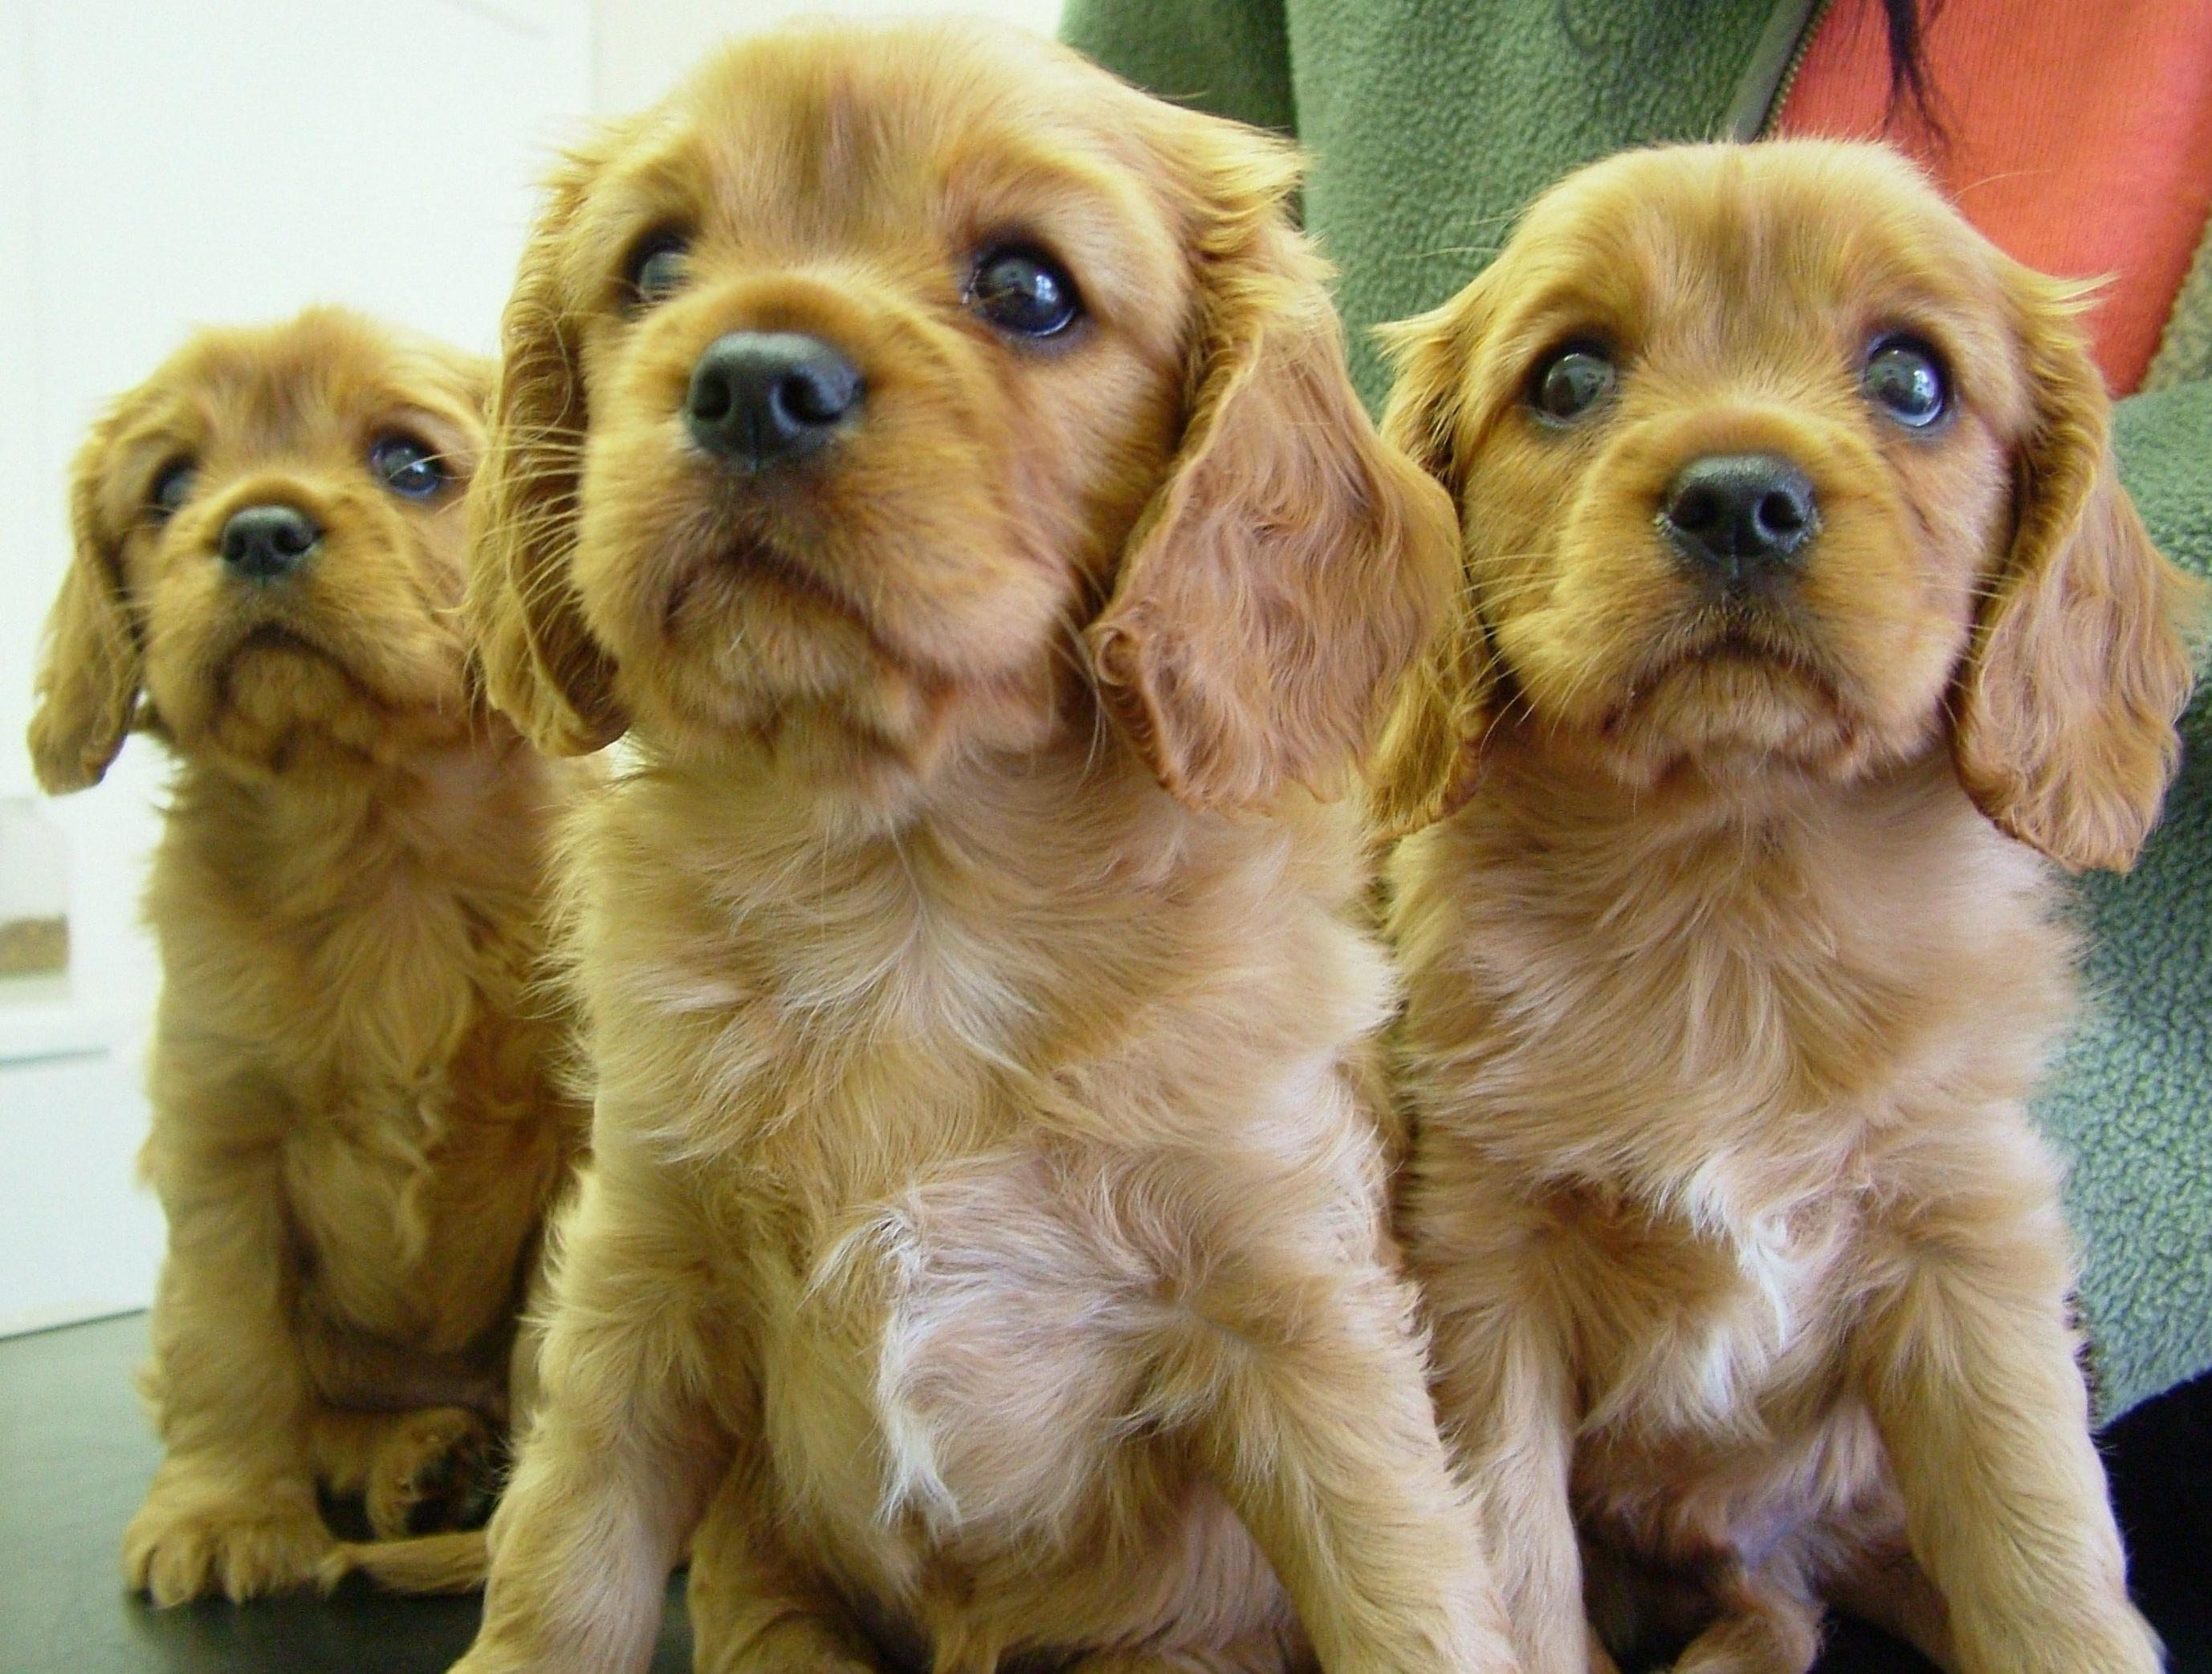 Cool Charles Spaniel Brown Adorable Dog - puppy-dog-animal-cute-mammal-spaniel-vertebrate-dog-breed-cavapoo-purebred-cavalier-king-charles-spaniel-cockapoo-king-charles-spaniel-dog-like-mammal-carnivoran-dog-breed-group-schnoodle-english-cocker-spaniel-dog-crossbreeds-cavachon-american-cocker-spaniel-546793  You Should Have_184816  .jpg